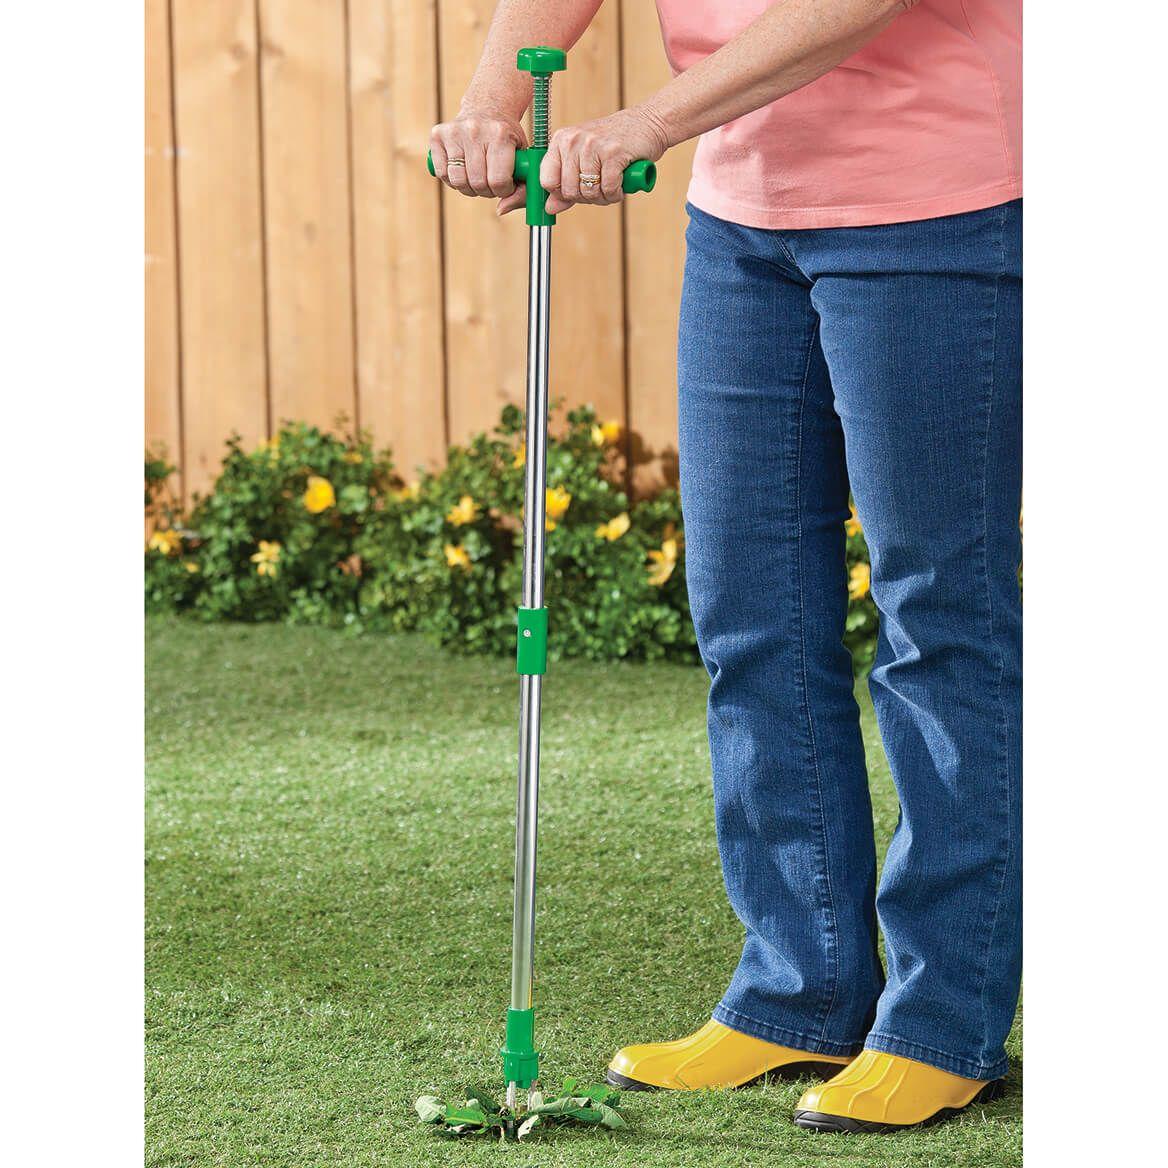 No-Bend Weed Grabber-350765